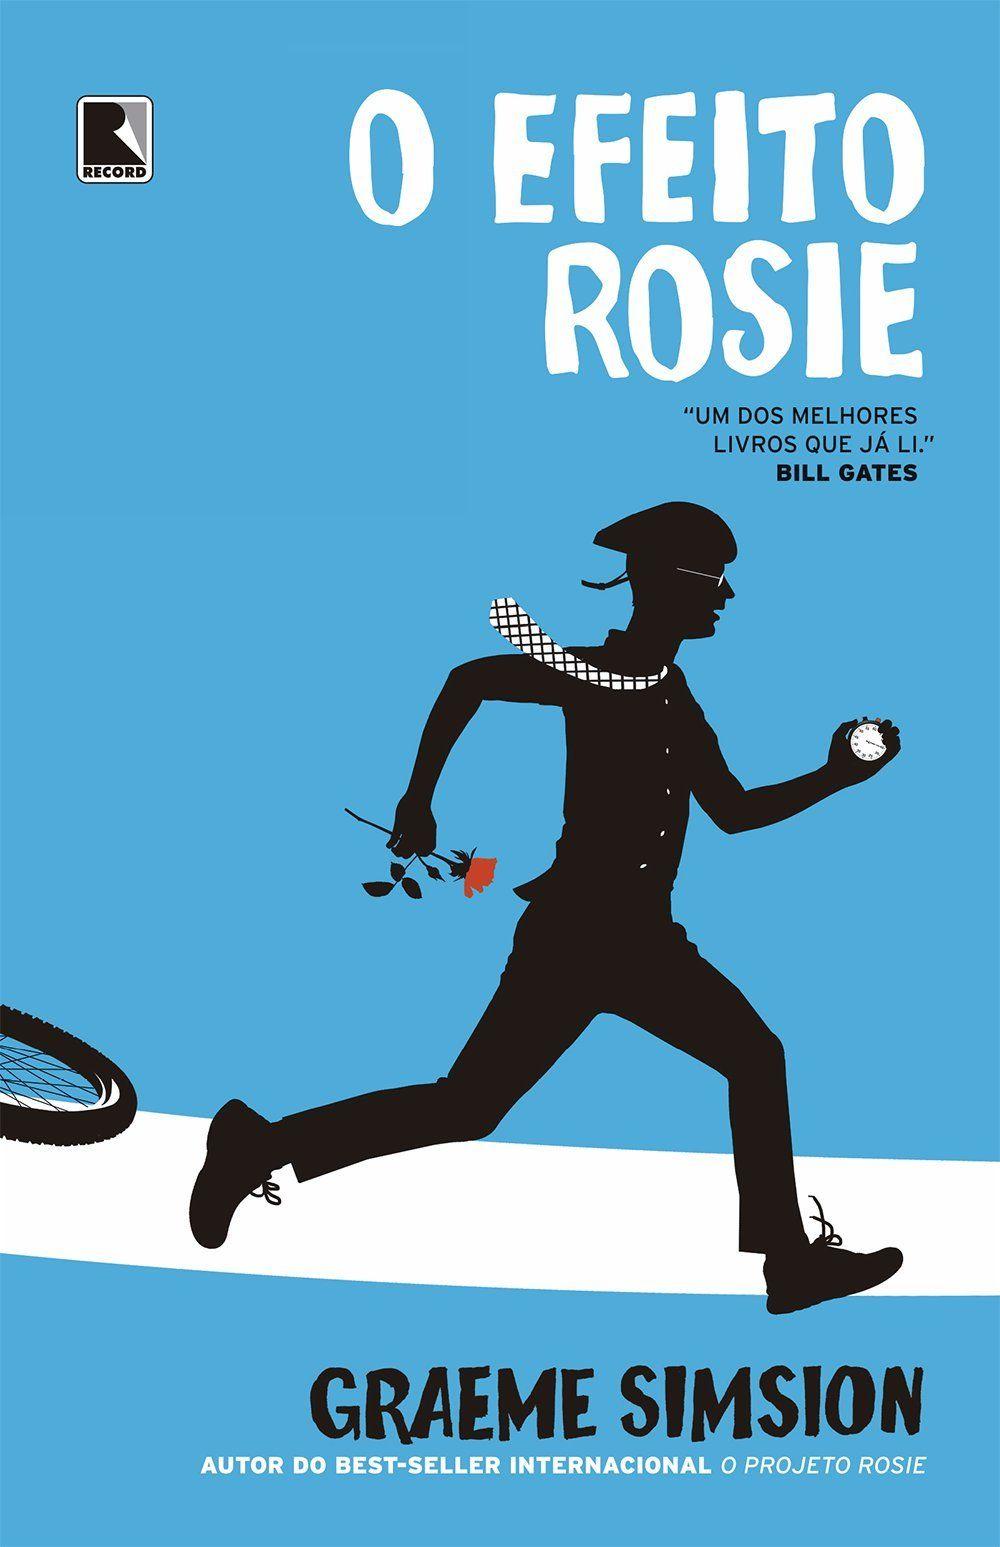 O Efeito Rosie (The Rosie Effect ) - Graeme Simsion - #Resenha   OBLOGDAMARI.COM